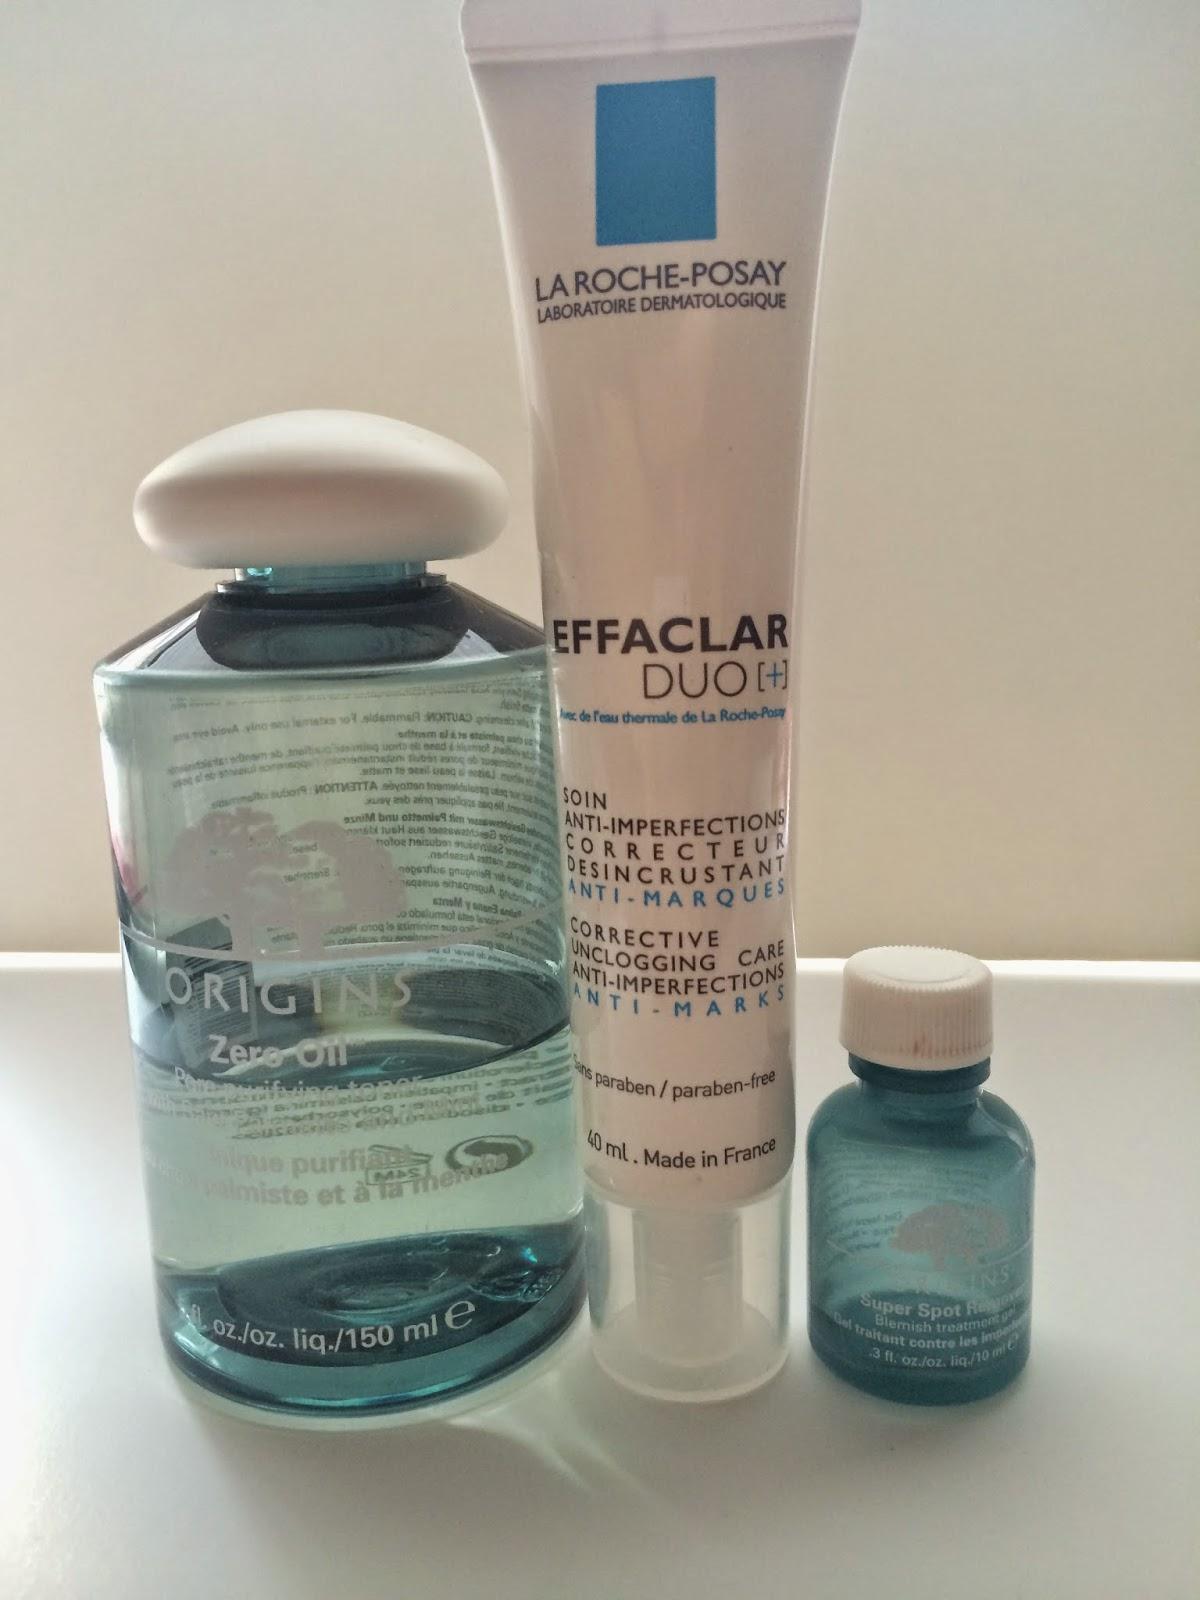 skin care routine, origins, origins zero oil, origins spot remover,